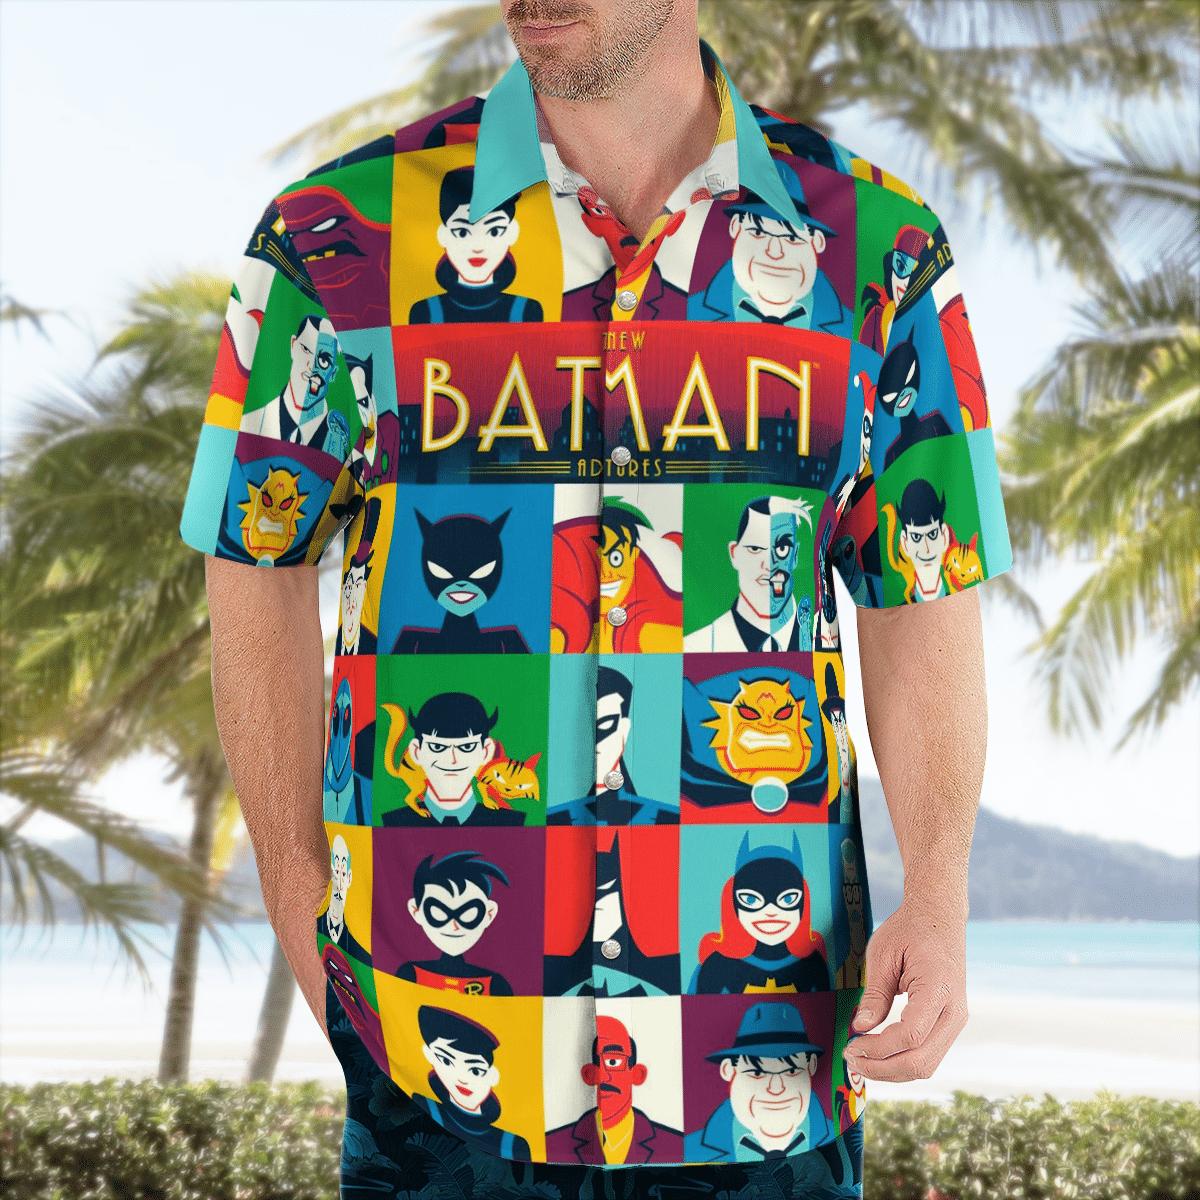 Animated The New Batman Adventure Hawaiian Shirt Summer Shirt